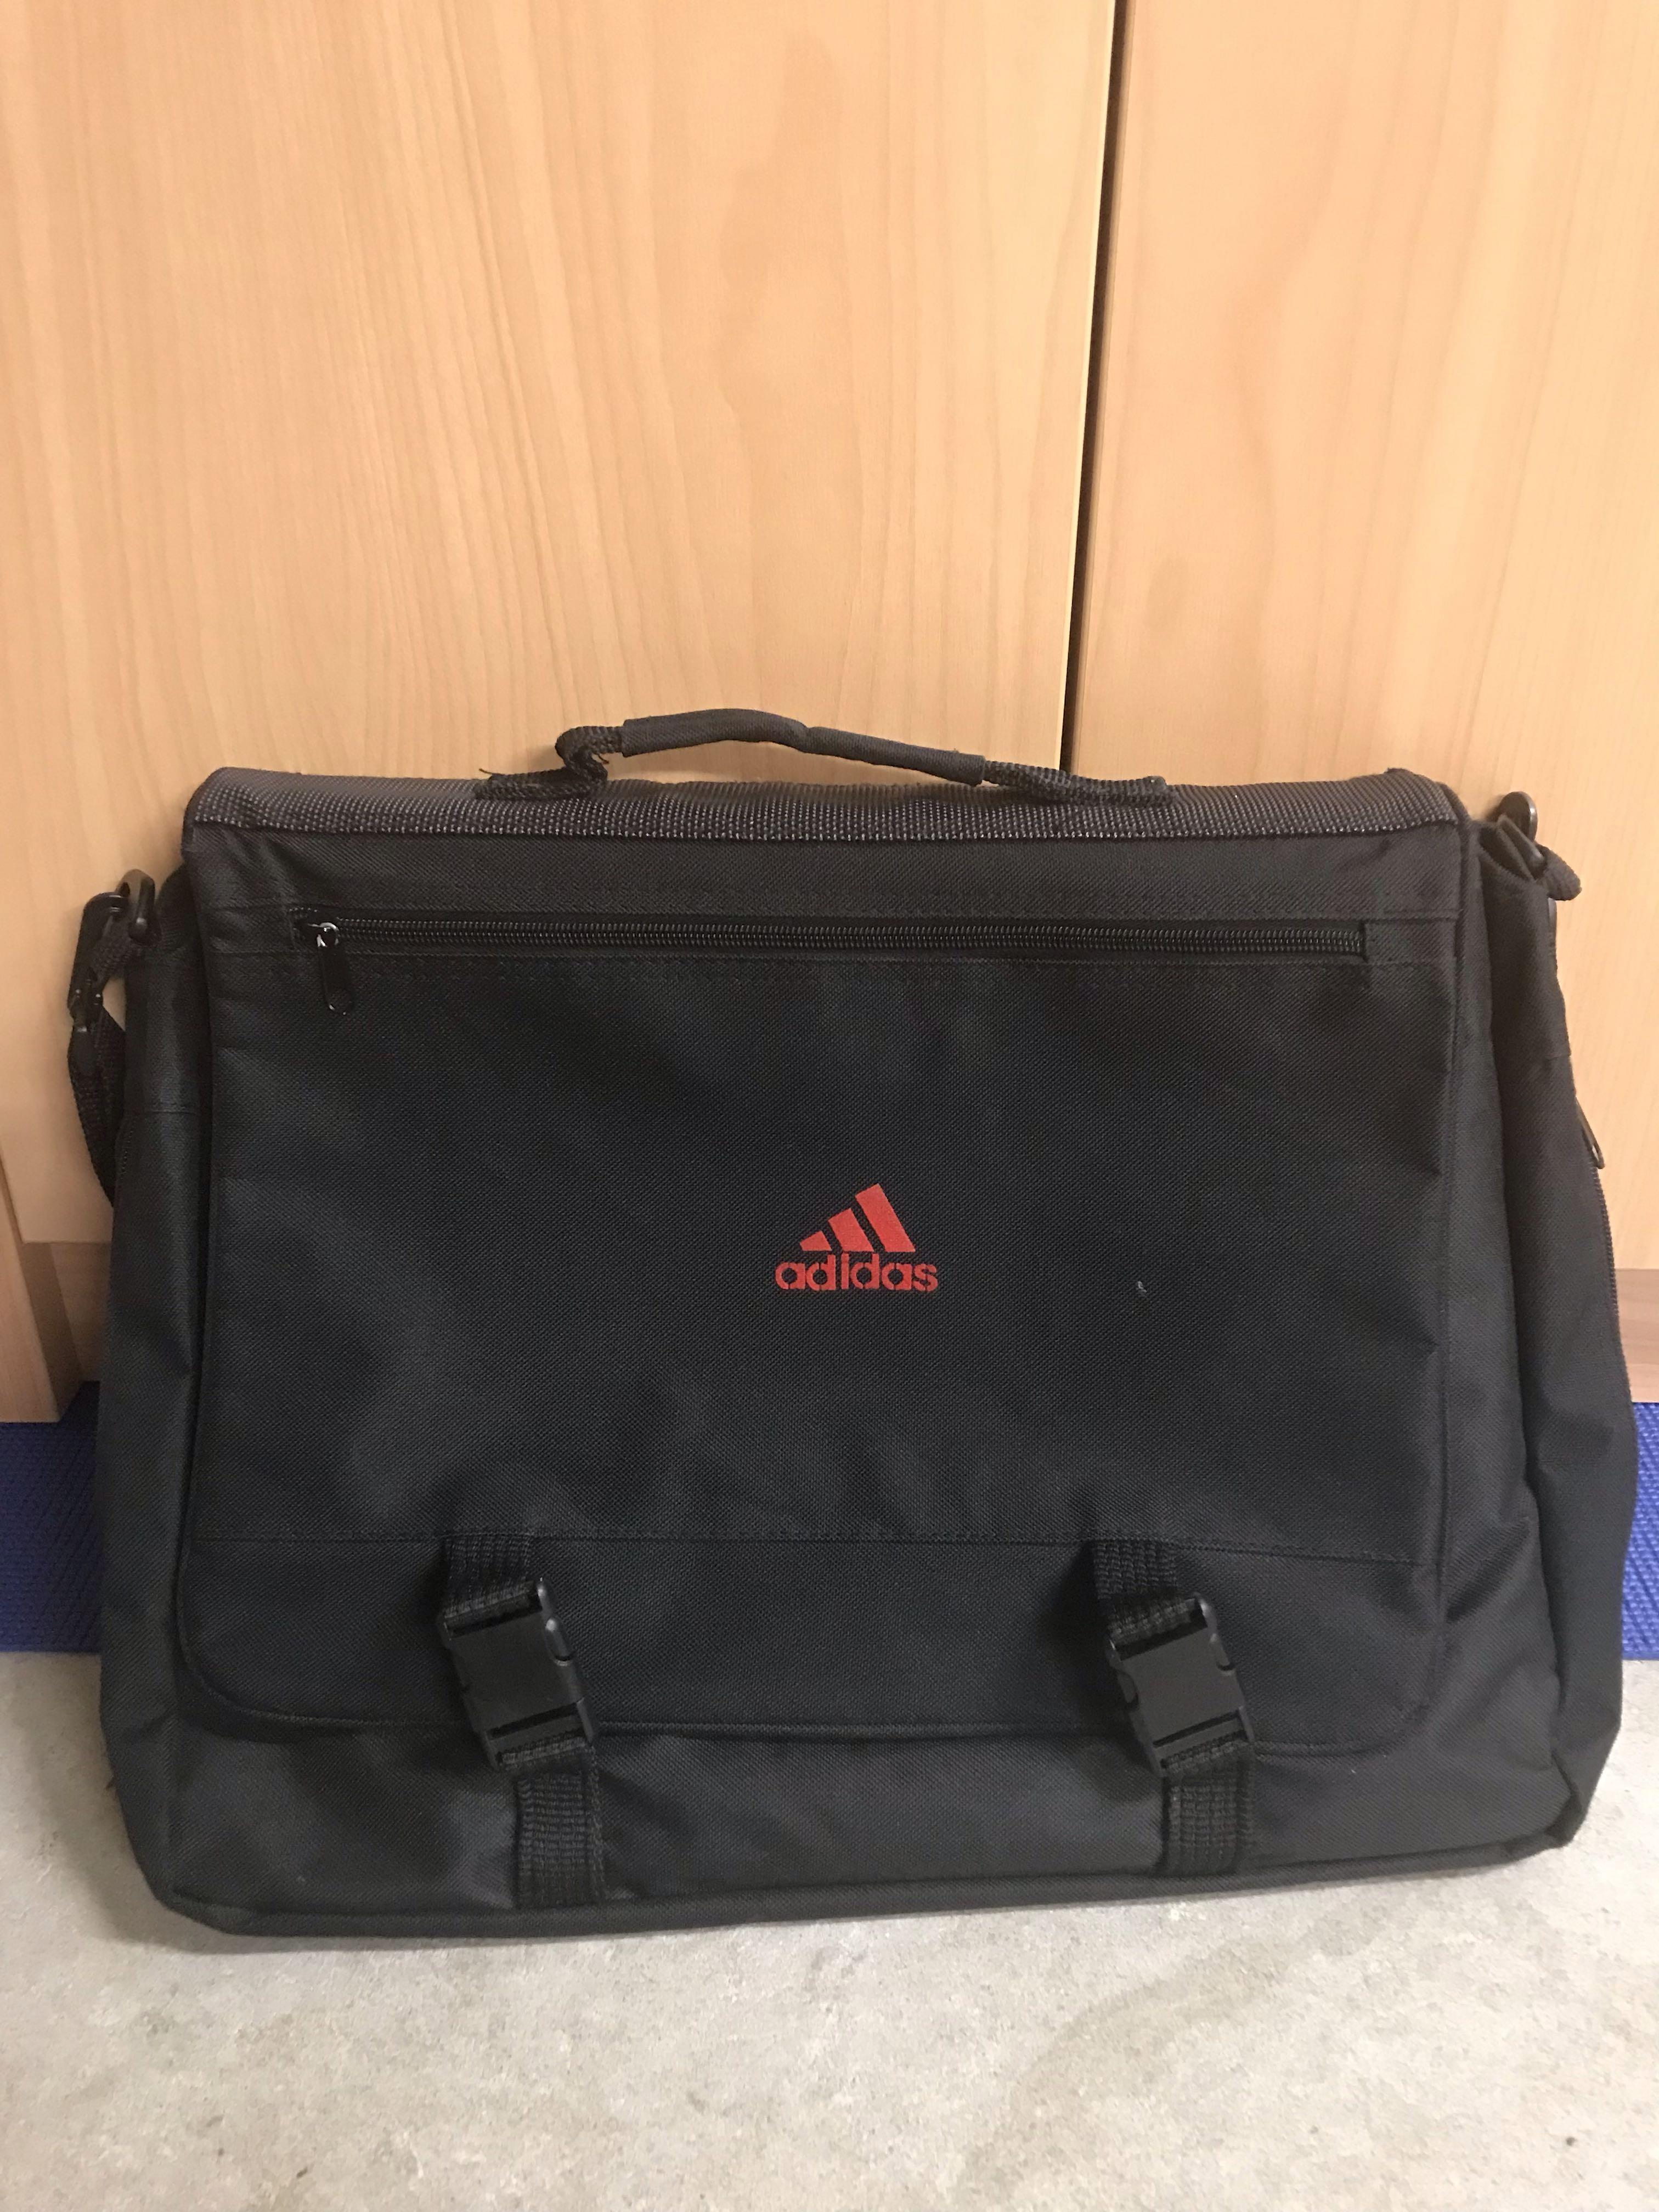 Adidas 17 Inch Laptop Bag